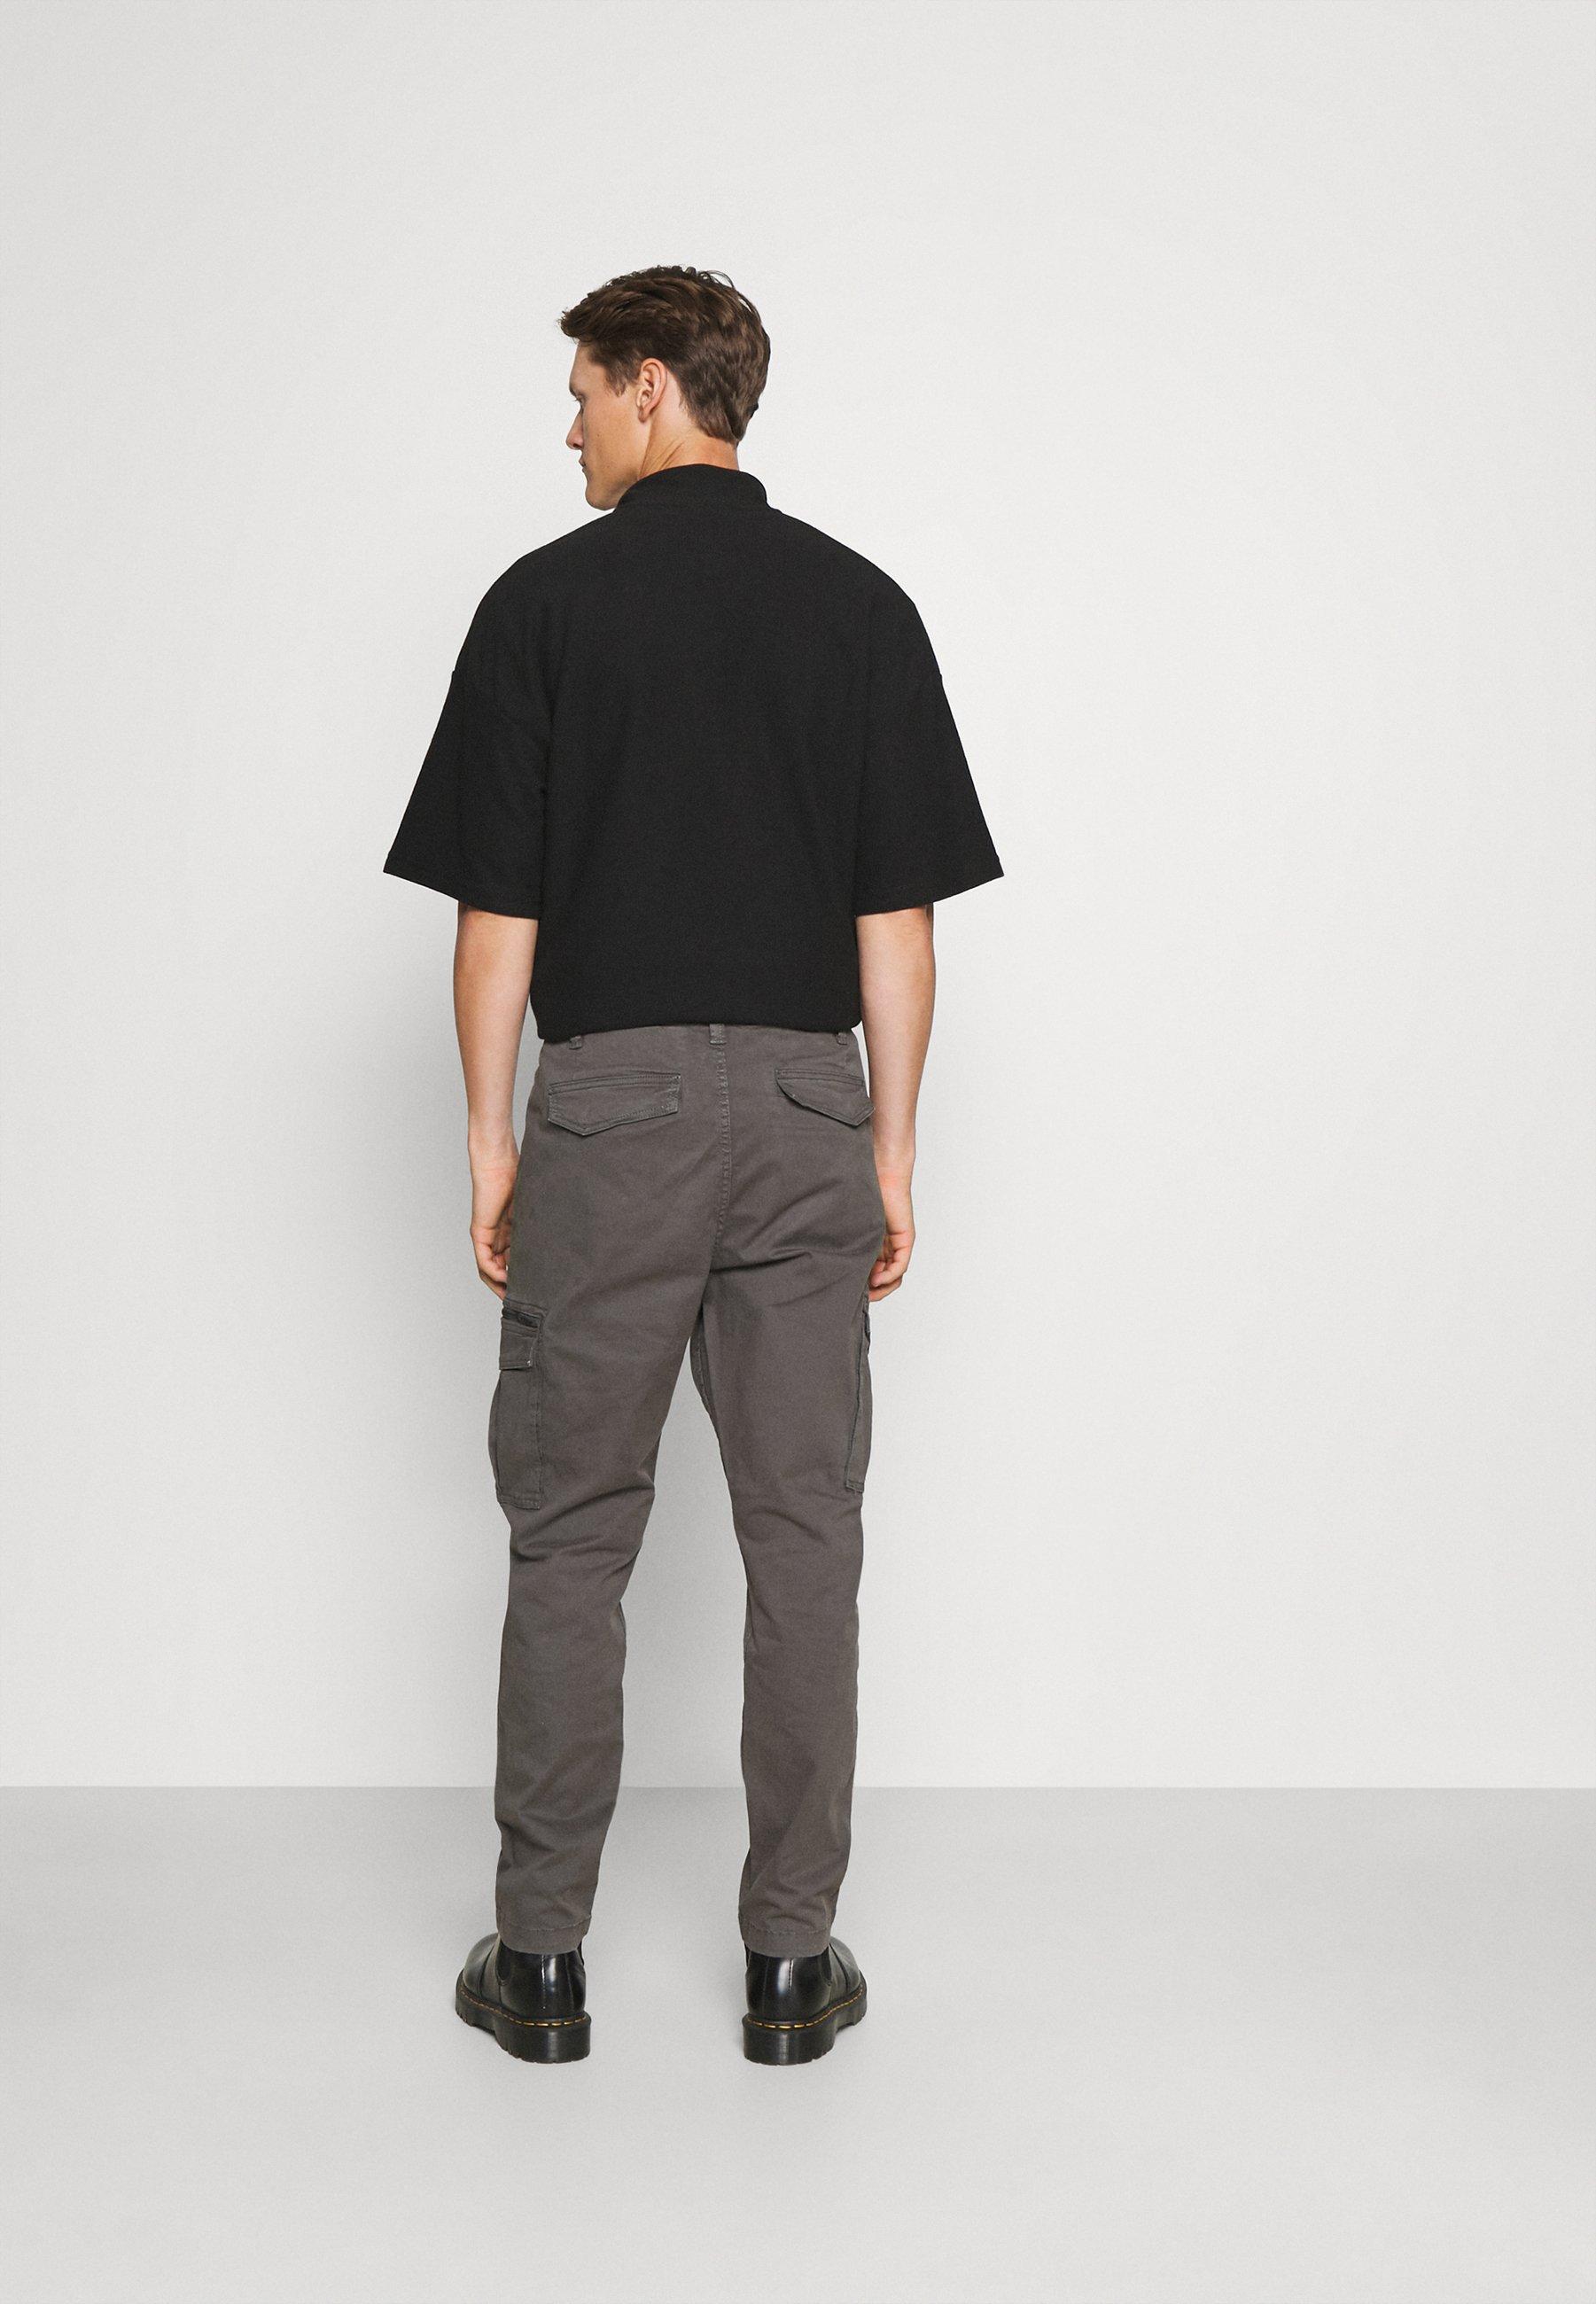 Homme ANDERS - Pantalon cargo